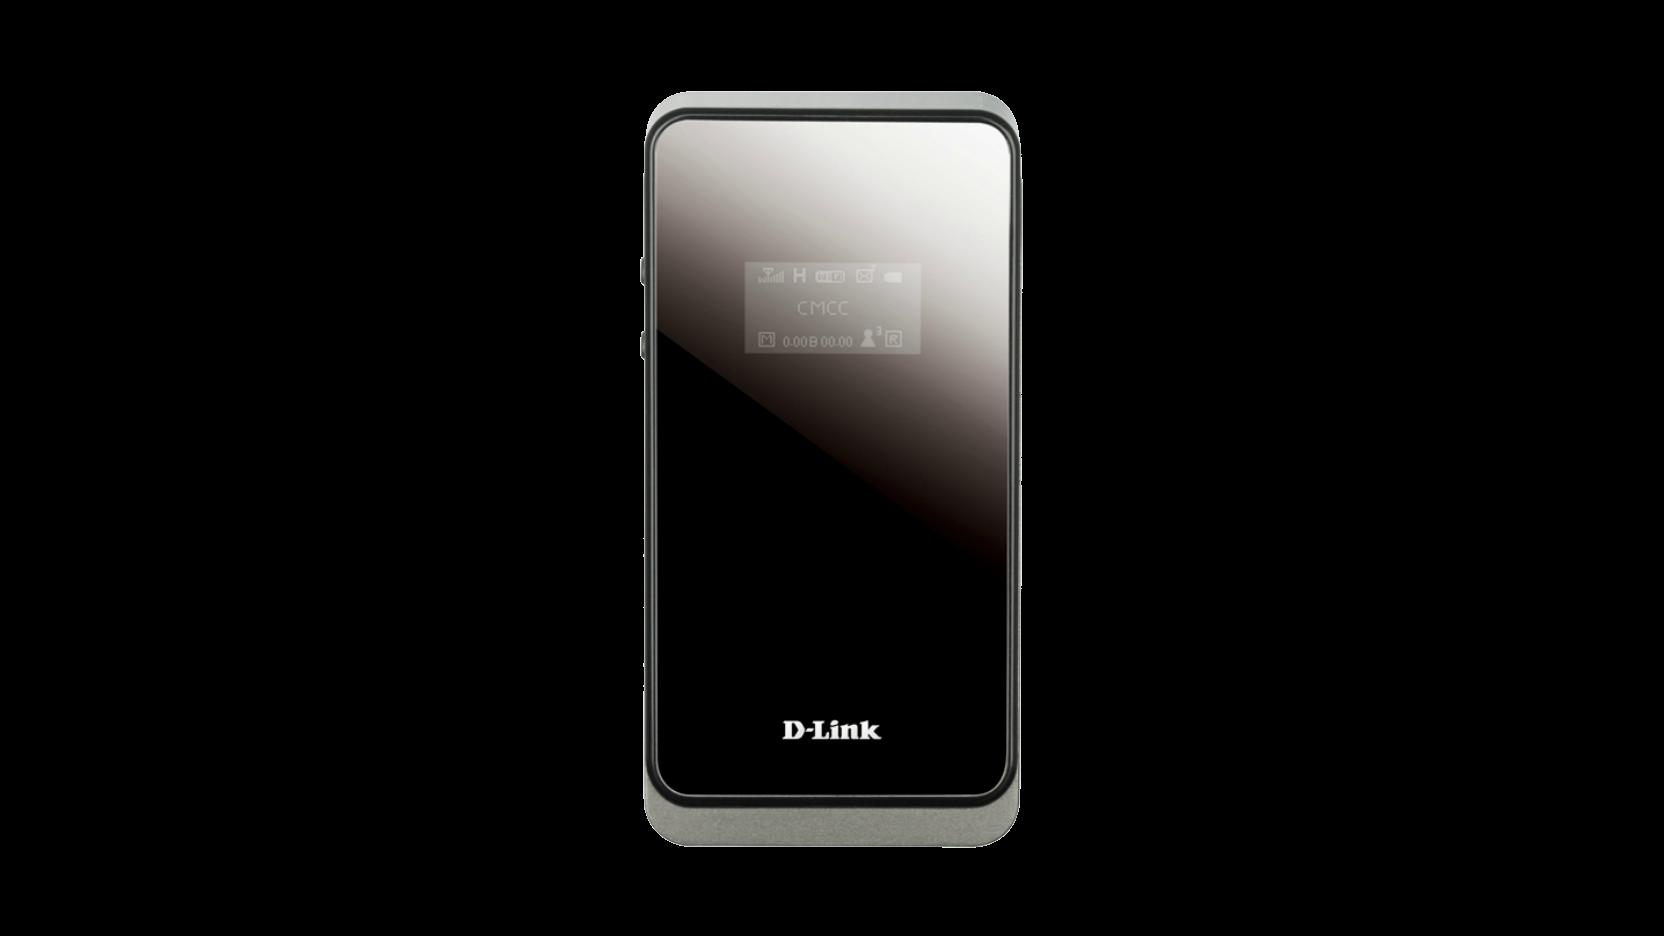 D-Link DWR-730 RevB2 Router Drivers Windows